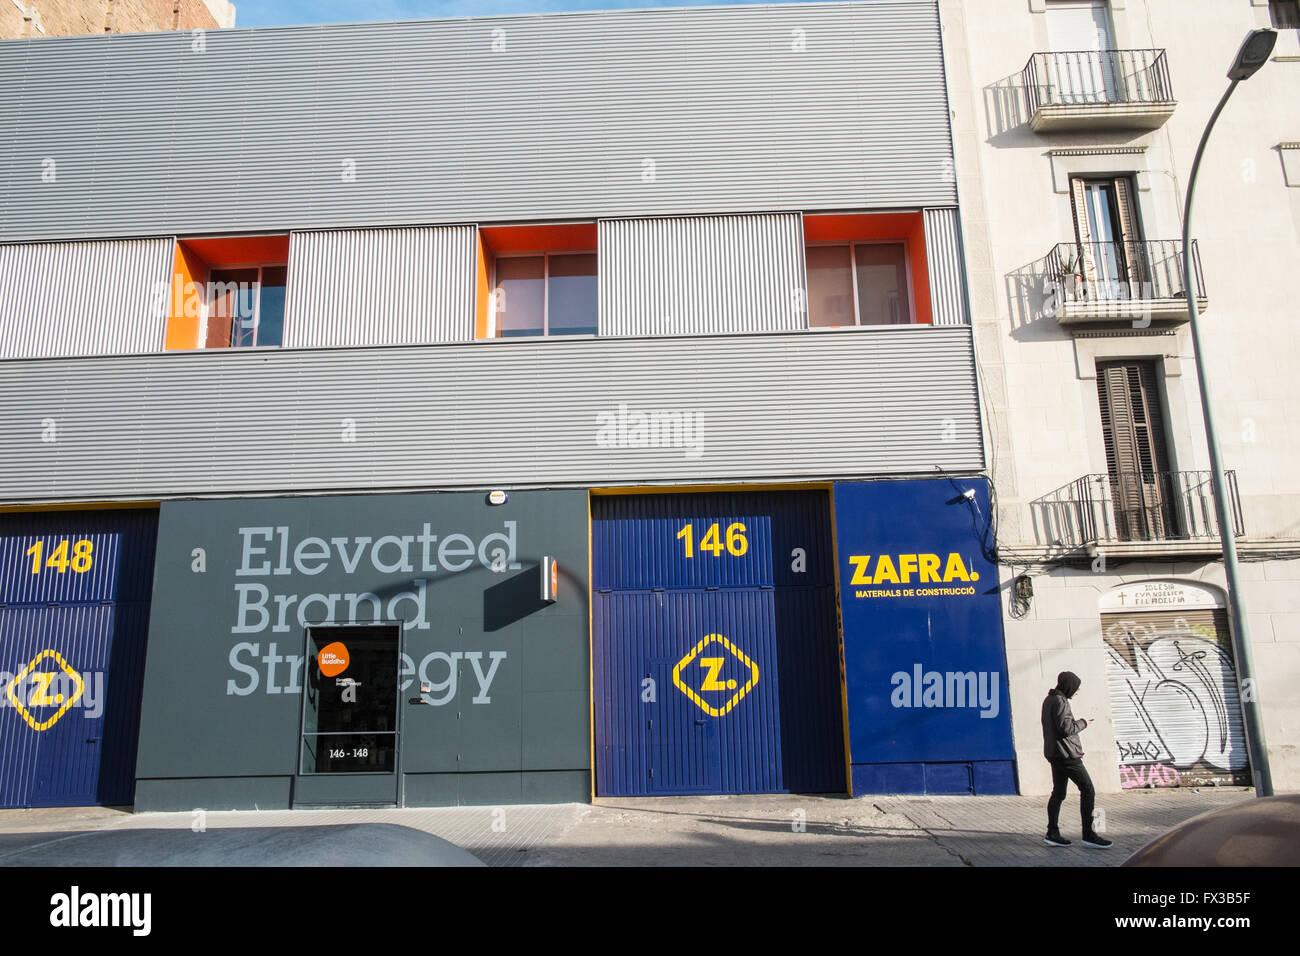 b3f2b91f8c Zafra A Lo Largo De La Calle De Pujades En La Zona De Poblenou De ...